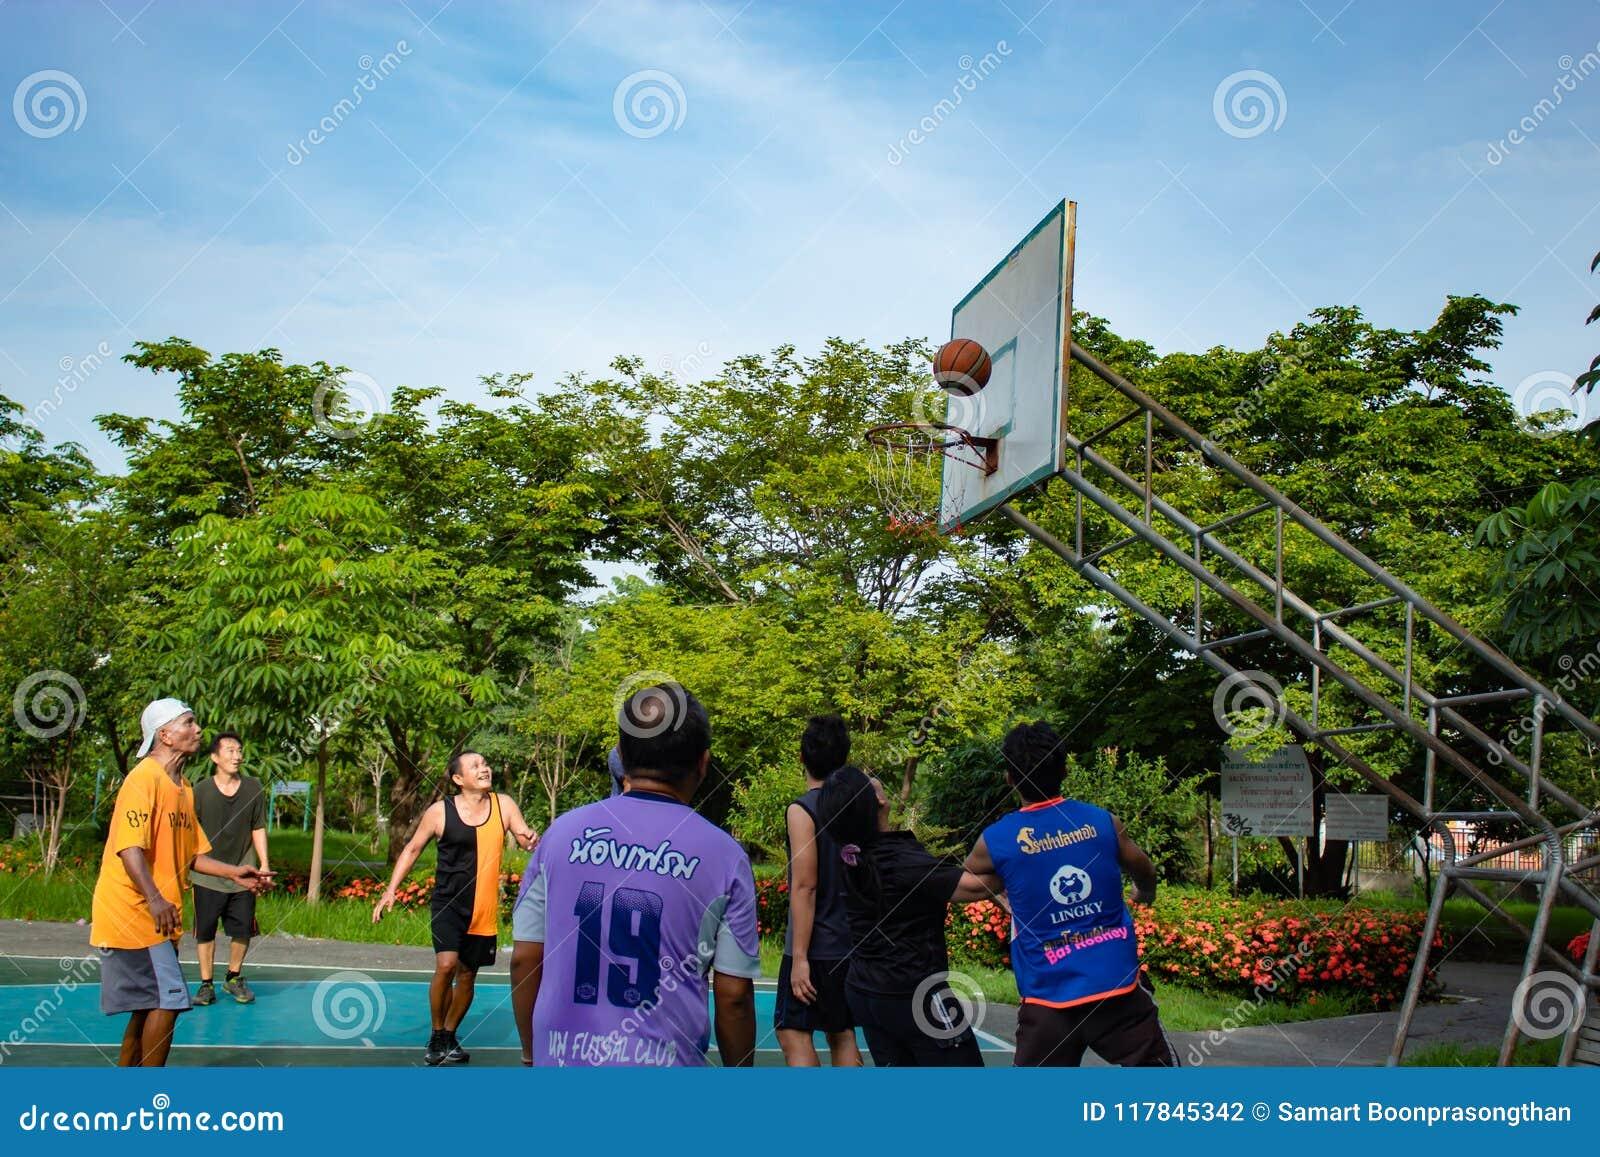 Nonthaburi在泰国,男人和妇女打在平均观测距离的篮球